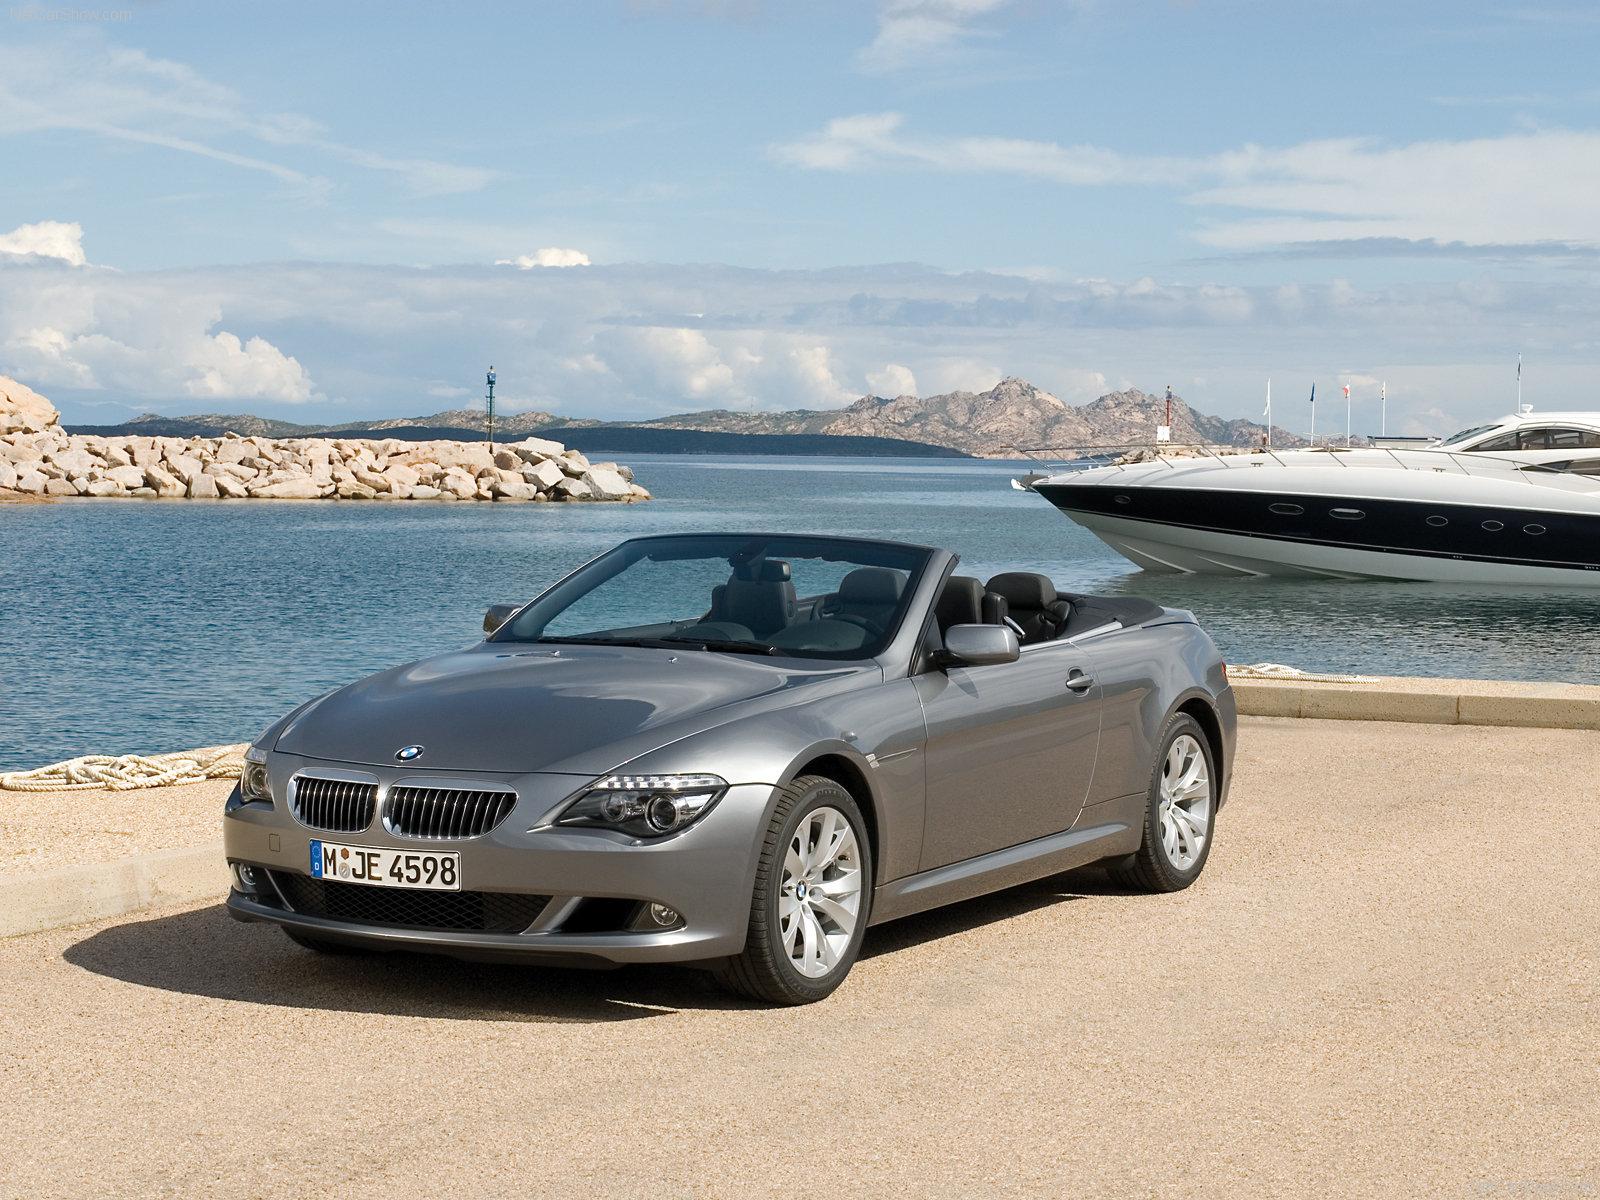 BMW 6-series E64 Convertible photo 45097